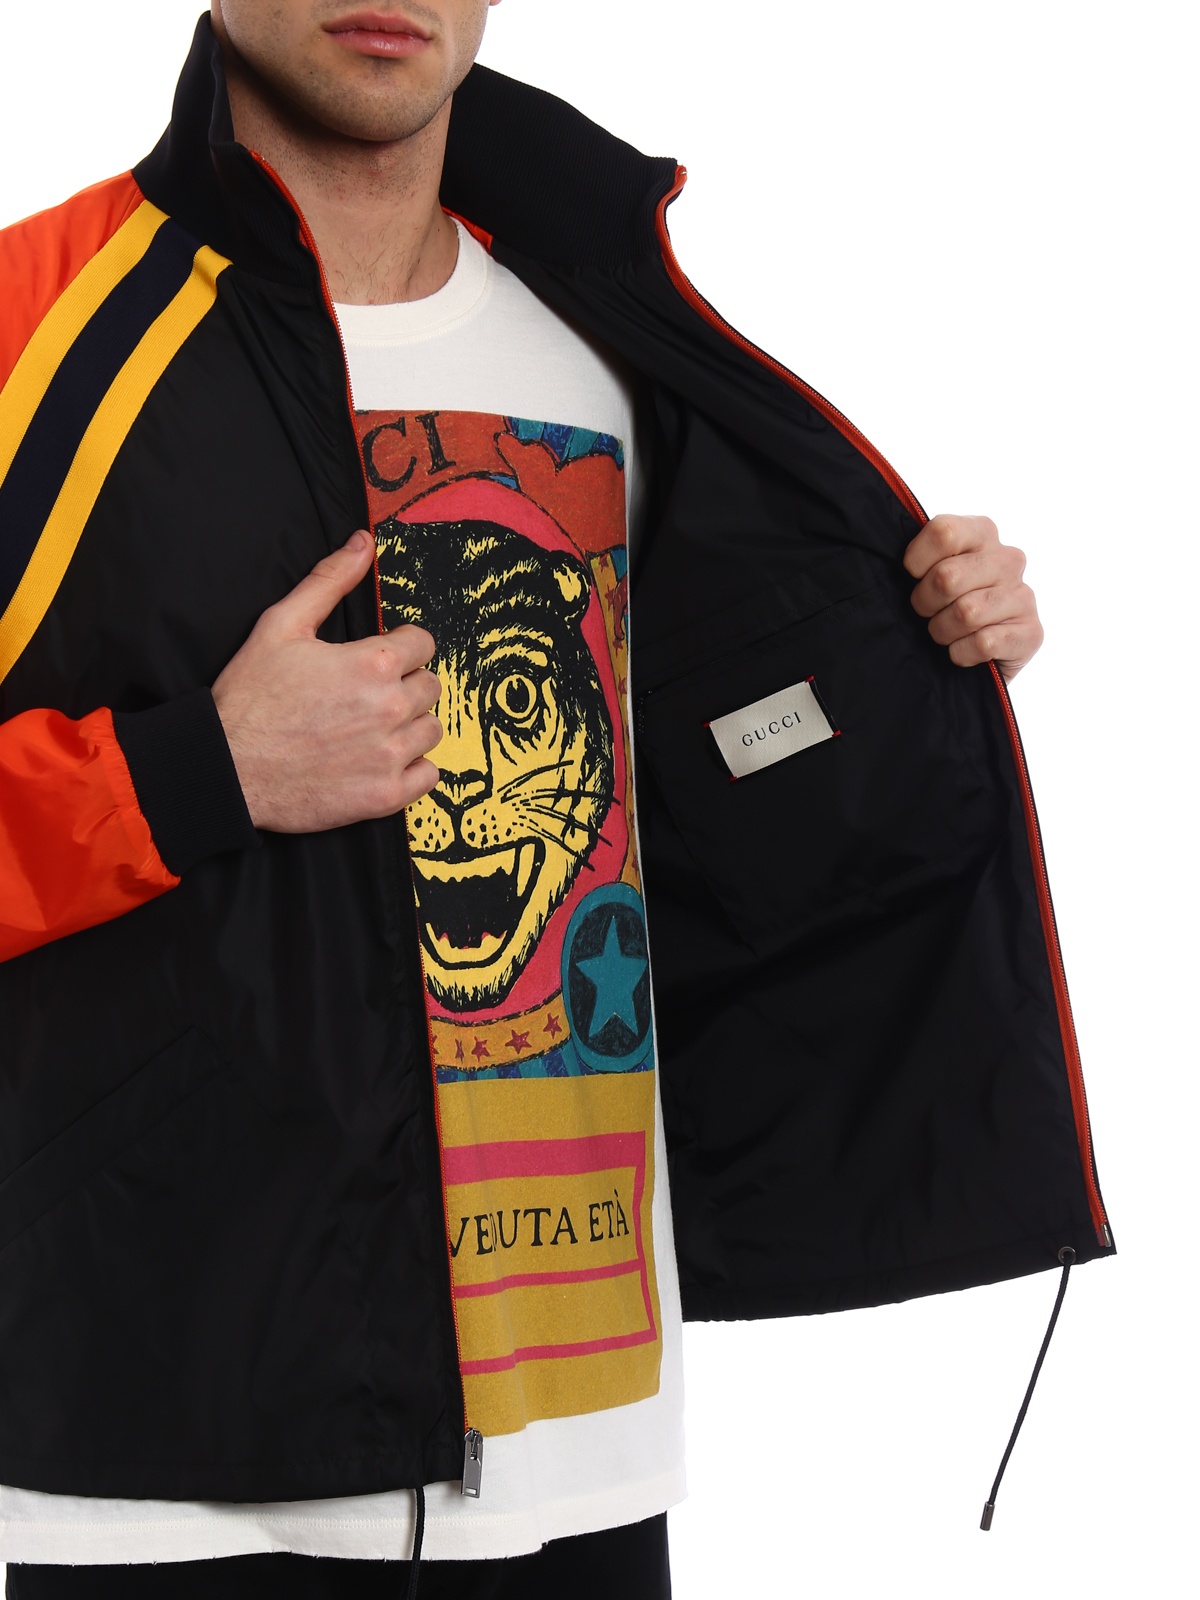 b3809f4a8fed Gucci - Black and orange nylon jacket - casual jackets - 500958Z707C1565